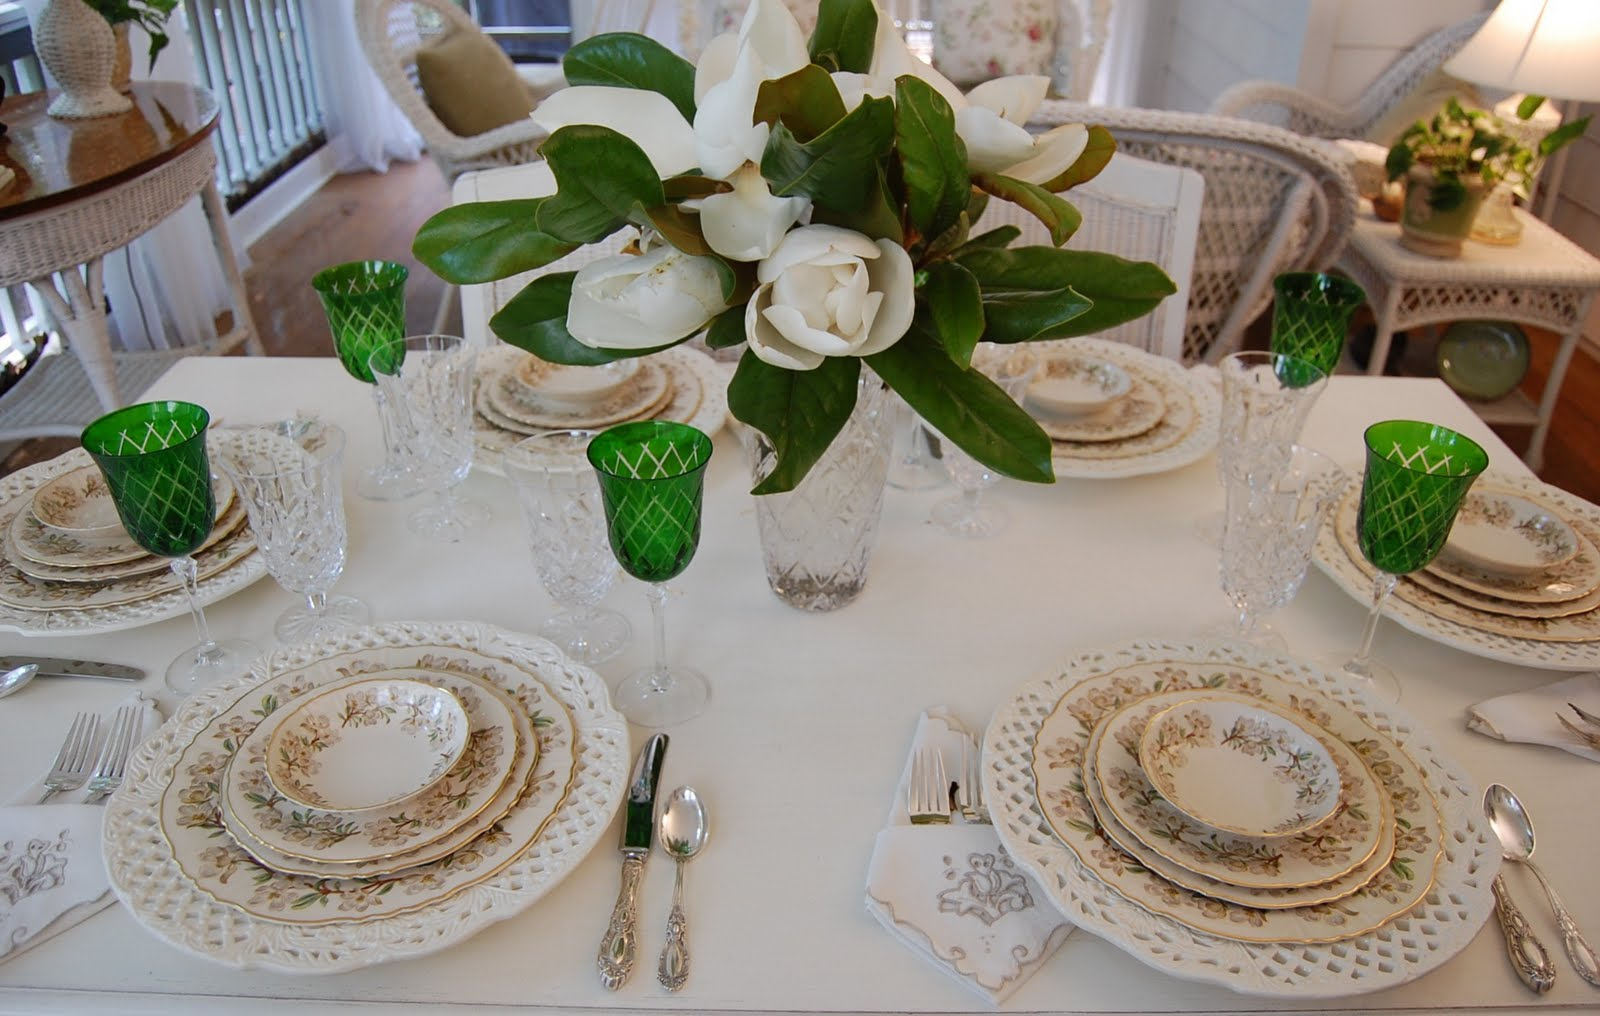 Summer tablescape with magnolia centerpiece